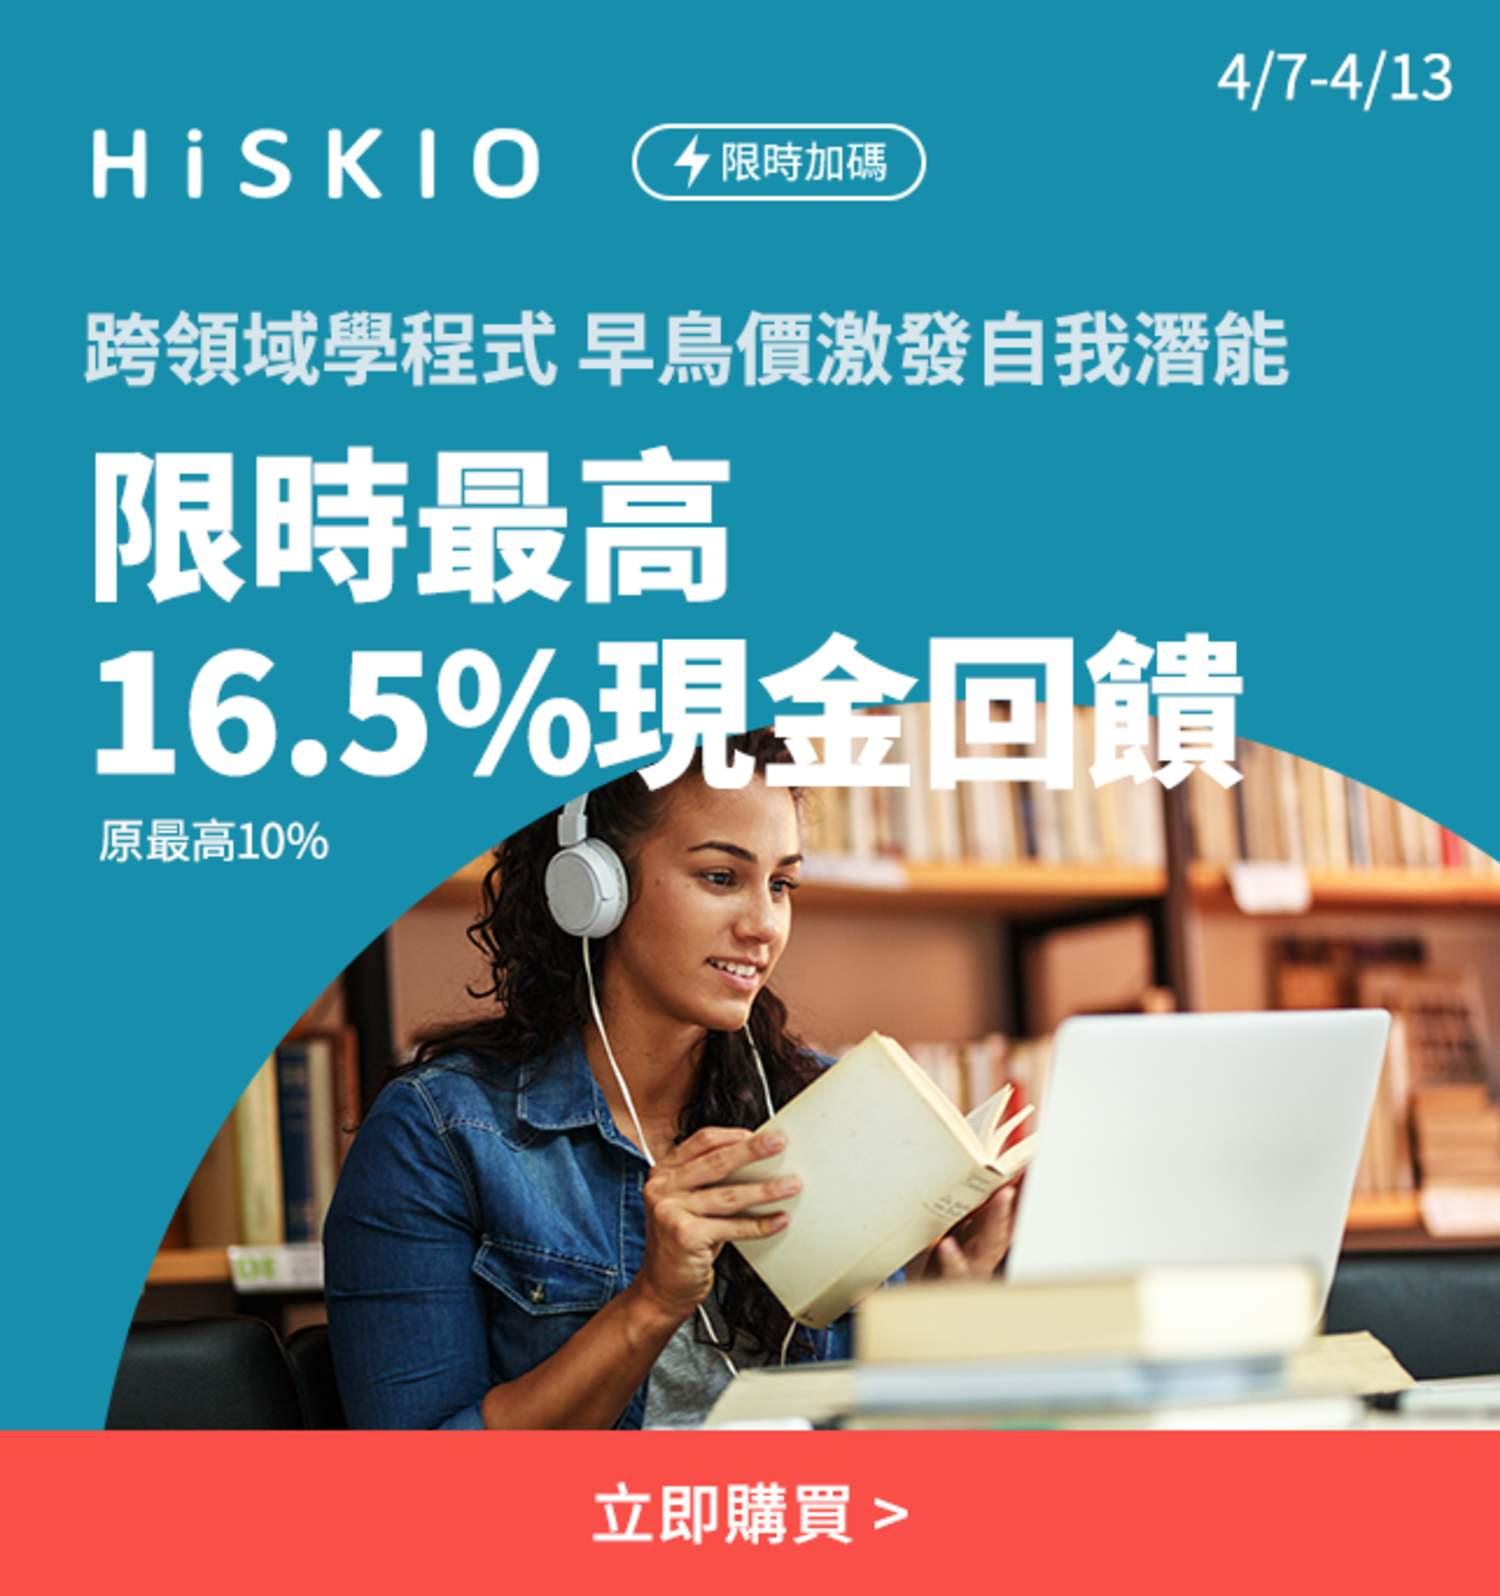 HiSKIO 4/8-4/10